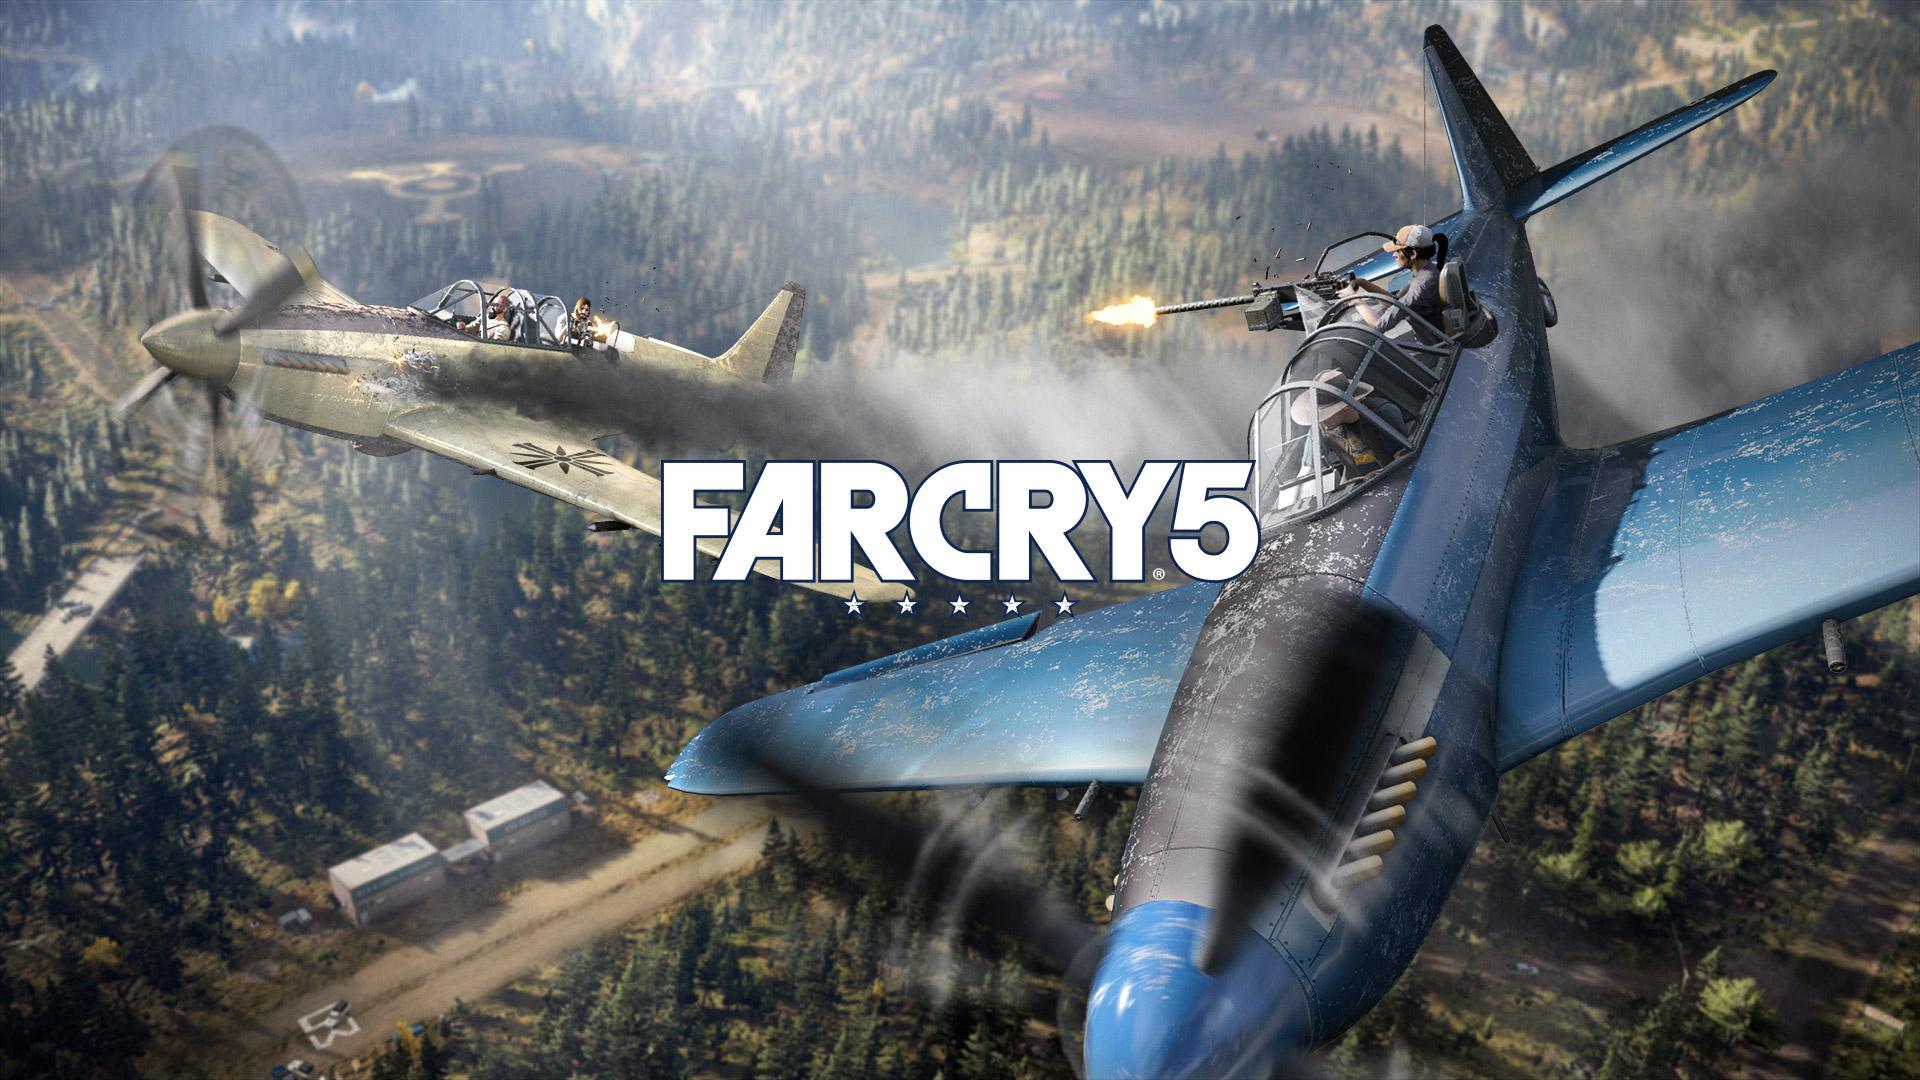 Far Cry 5 Wallpaper in 1920x1080